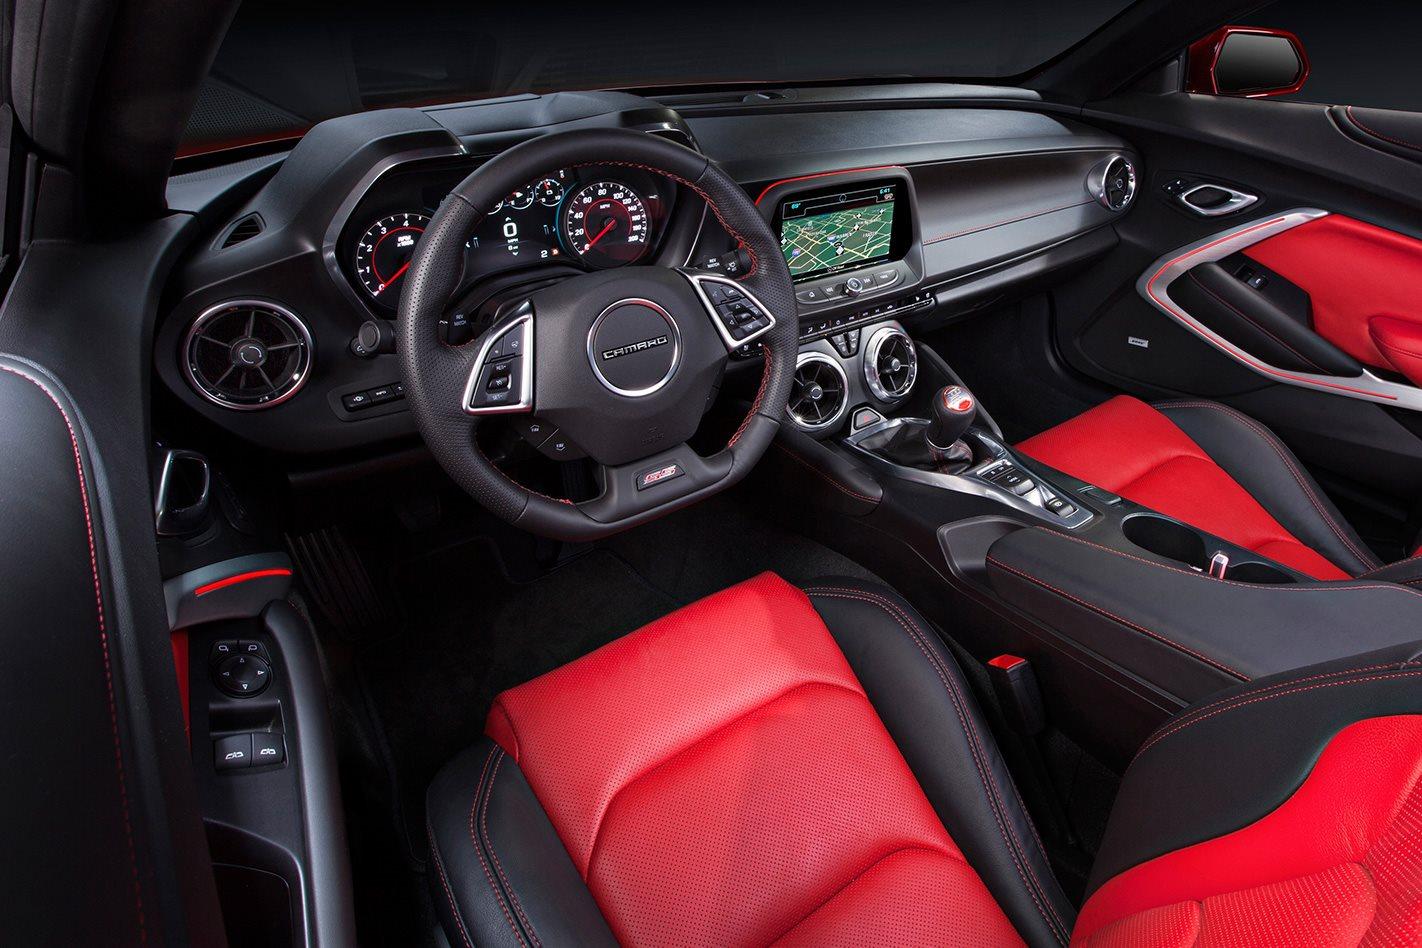 2016-Chevrolet-Camaro-interior.jpg